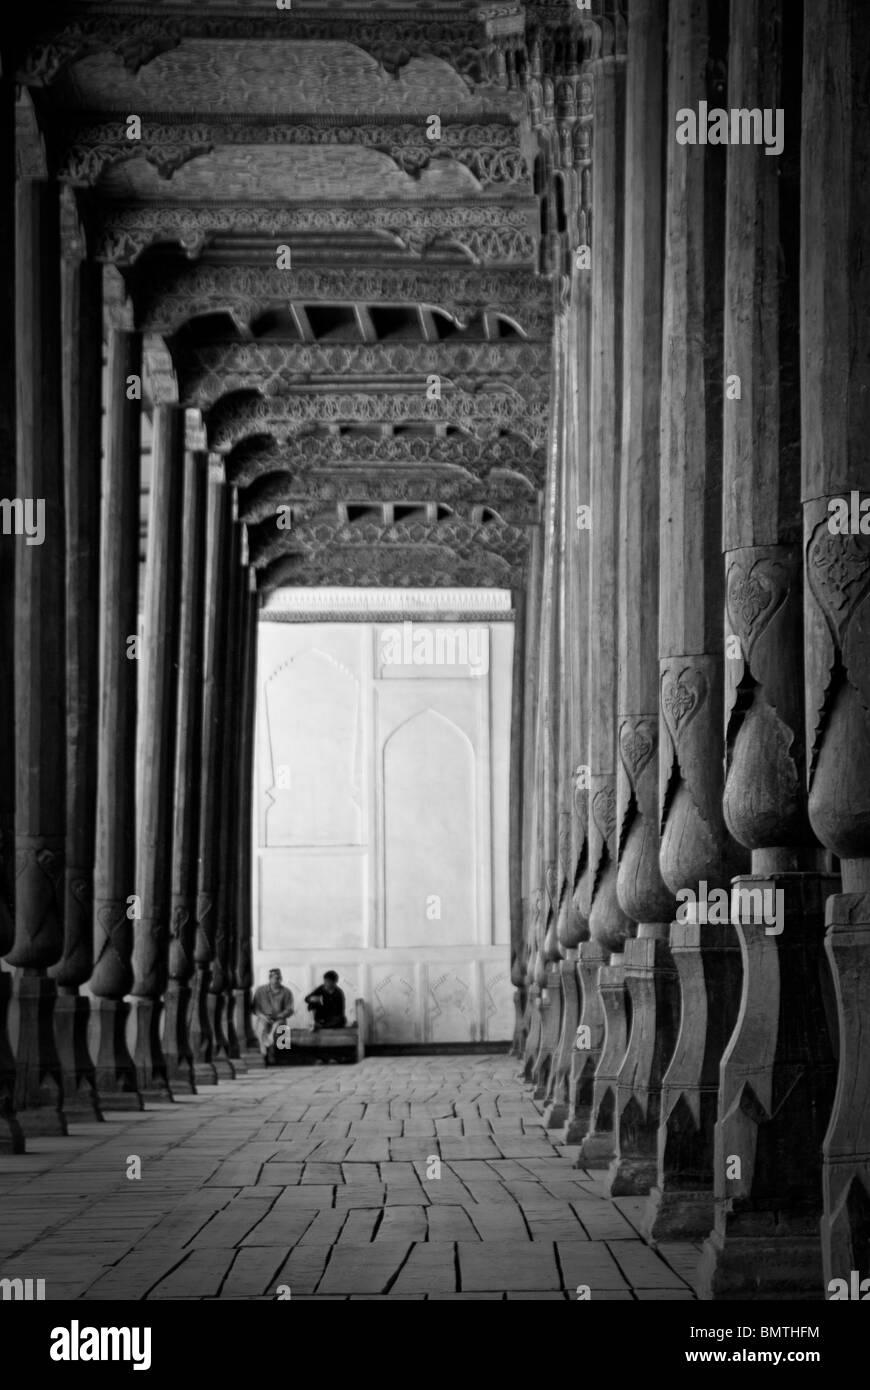 Juma Mosque, Khokand, Uzbekistan. - Stock Image